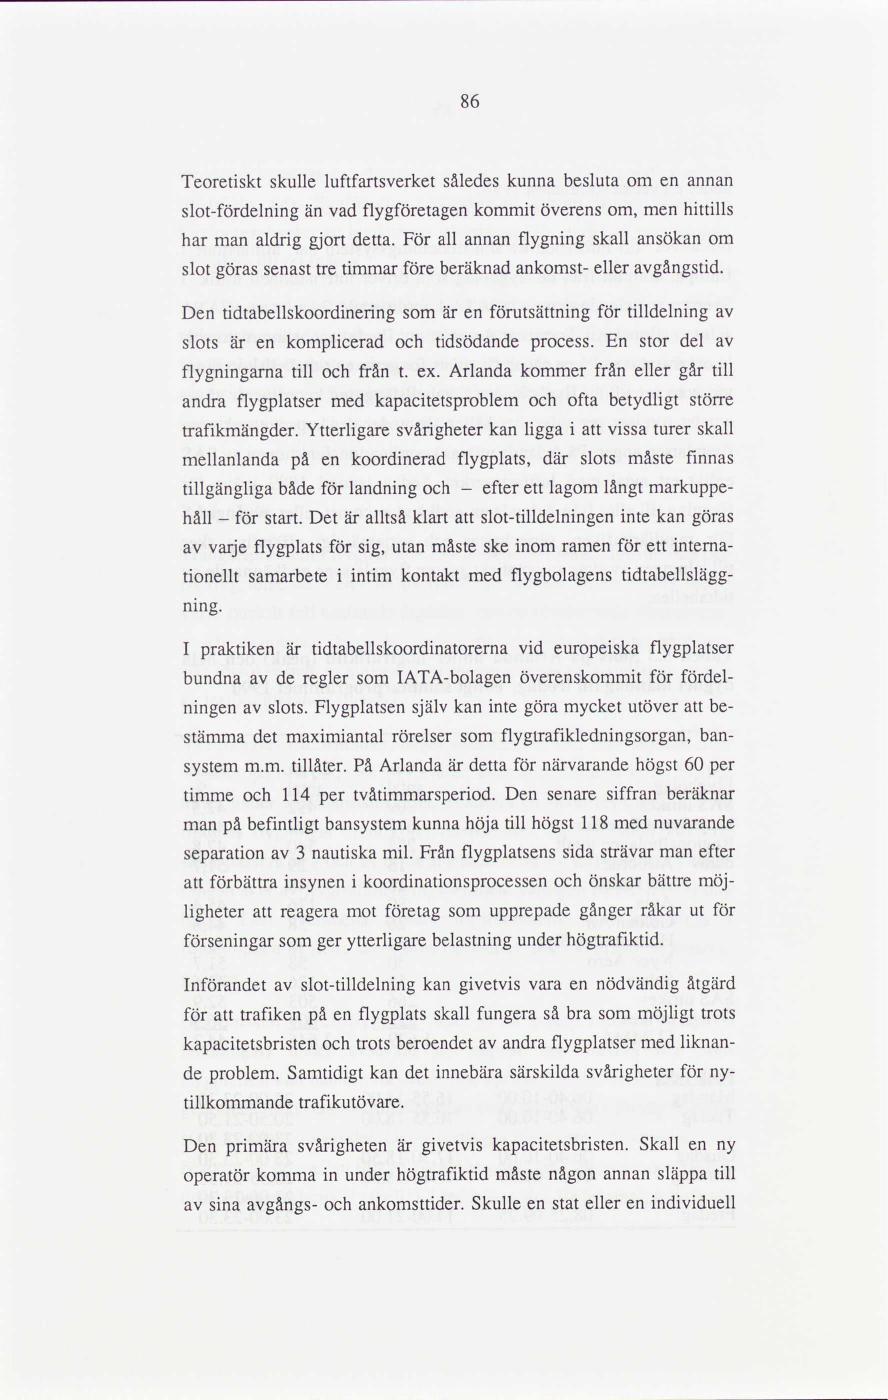 7737a9f5b178 Konkurrens i inrikesflyget : delbetänkande | lagen.nu